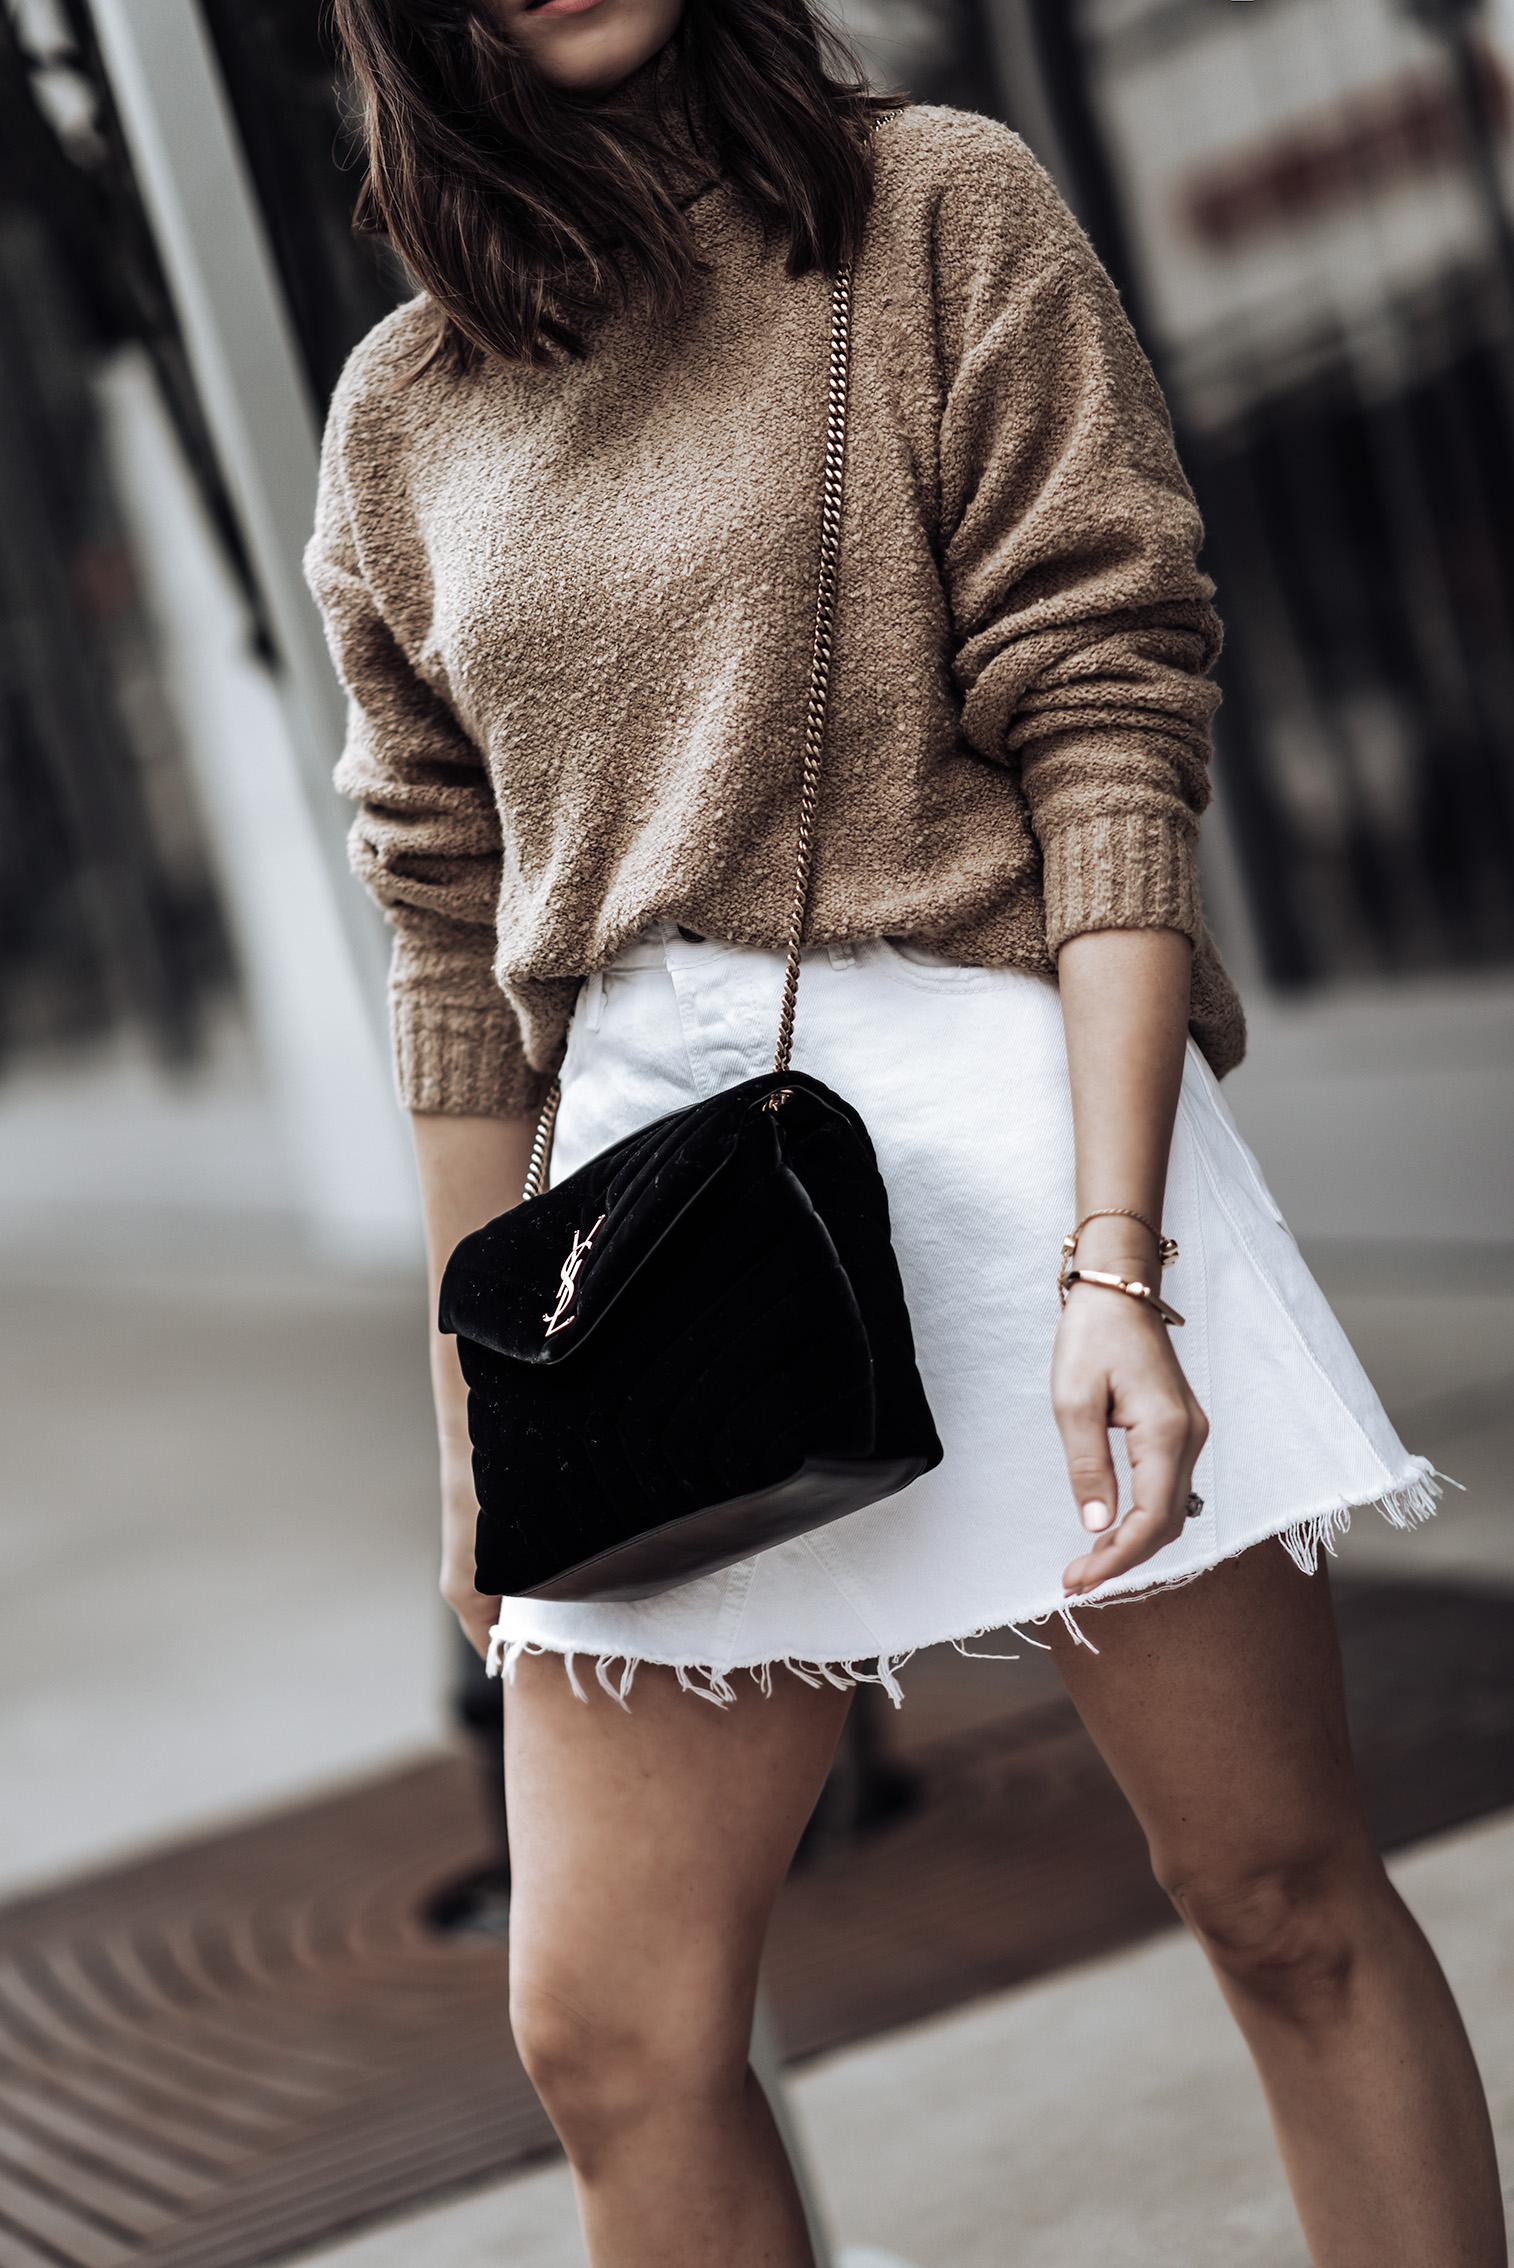 Combat boot trend   #streetstyle #blog #liketkit {C/O}GRLFRND Denim Eva A- Frame Skirt   {C/O} House of Harlow 1960 x REVOLVE Renee Pullover   Saint Laurent Small Black LouLou Velvet Bag   Bakers Cap (Similar)  Balenciaga boots Real vs.Steal)